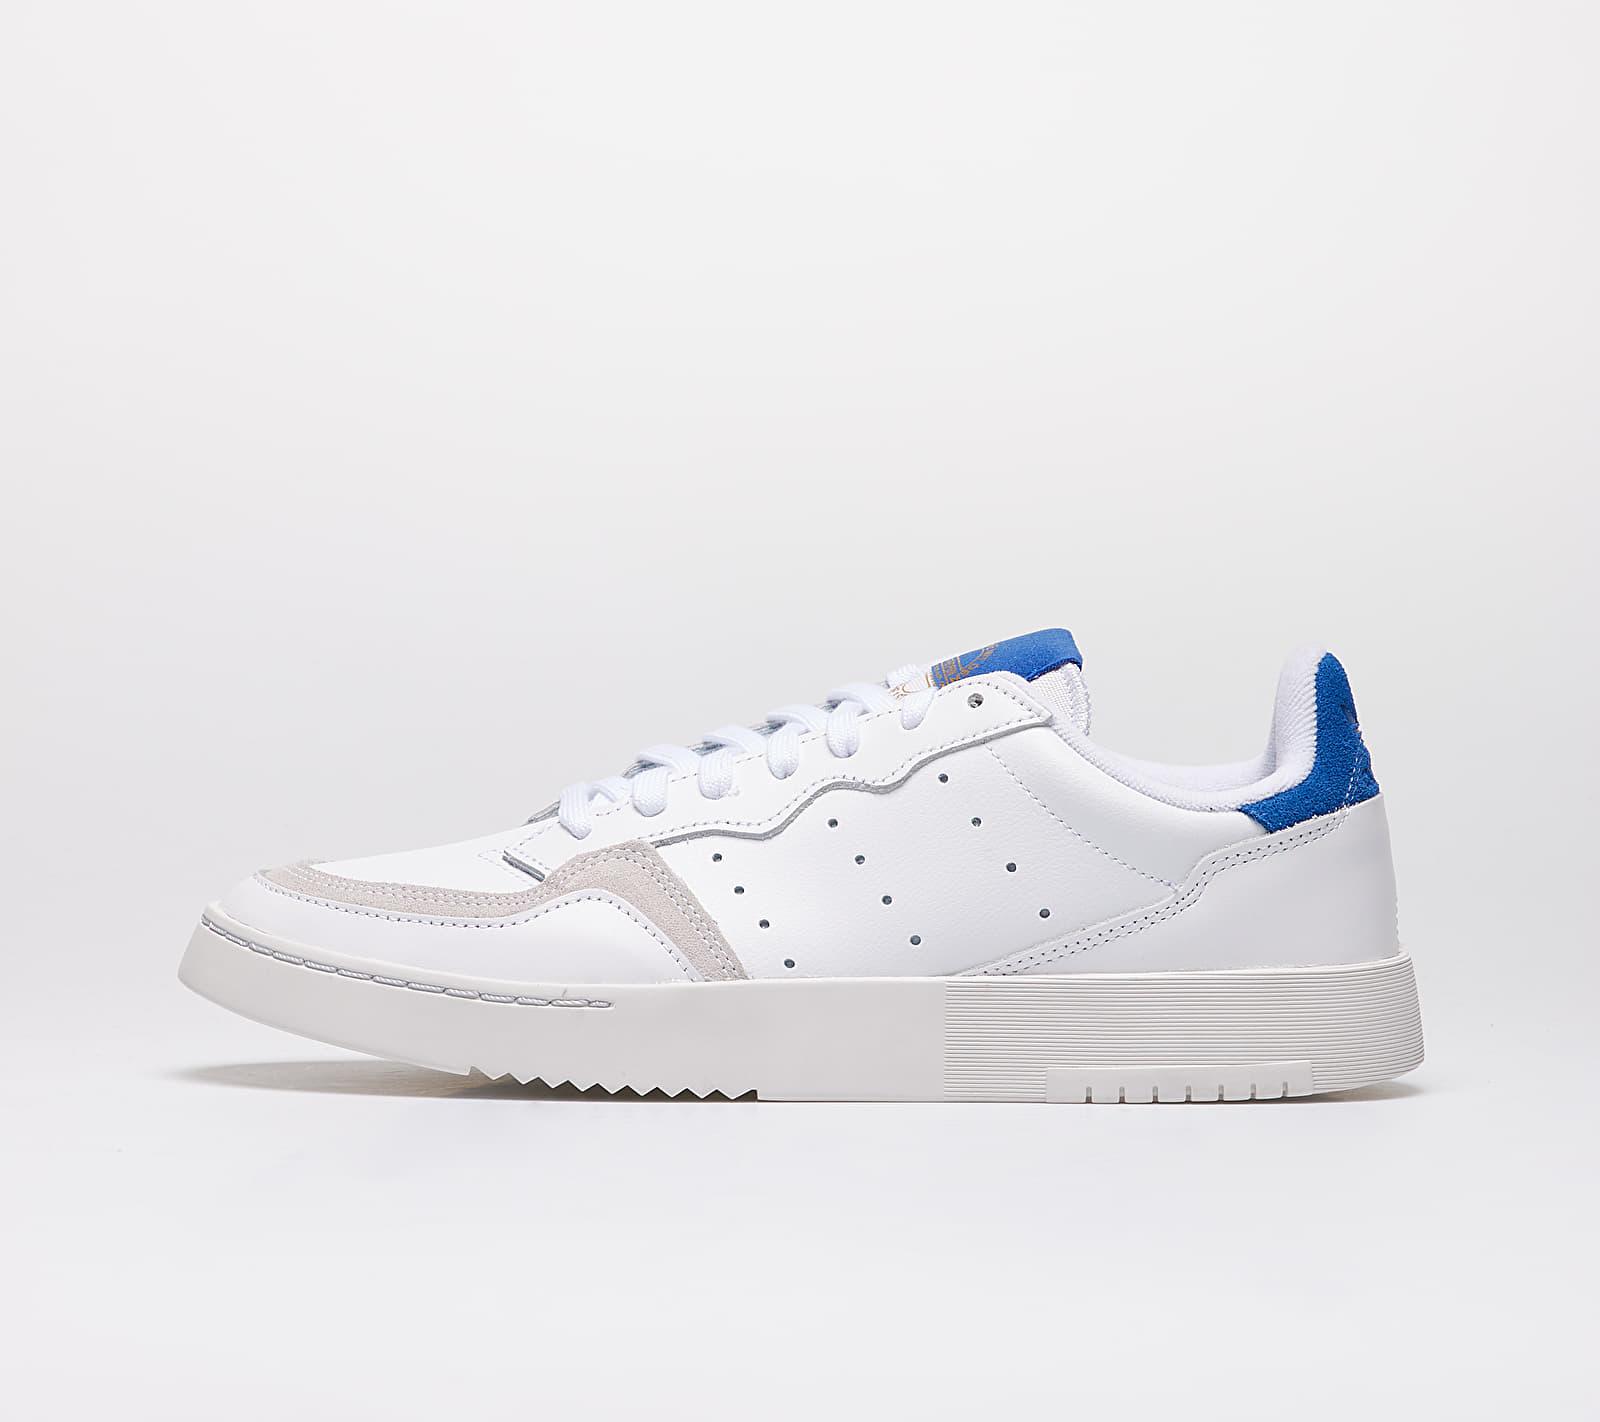 adidas Supercourt Ftw White/ Ftw White/ Royal Blue EF5885